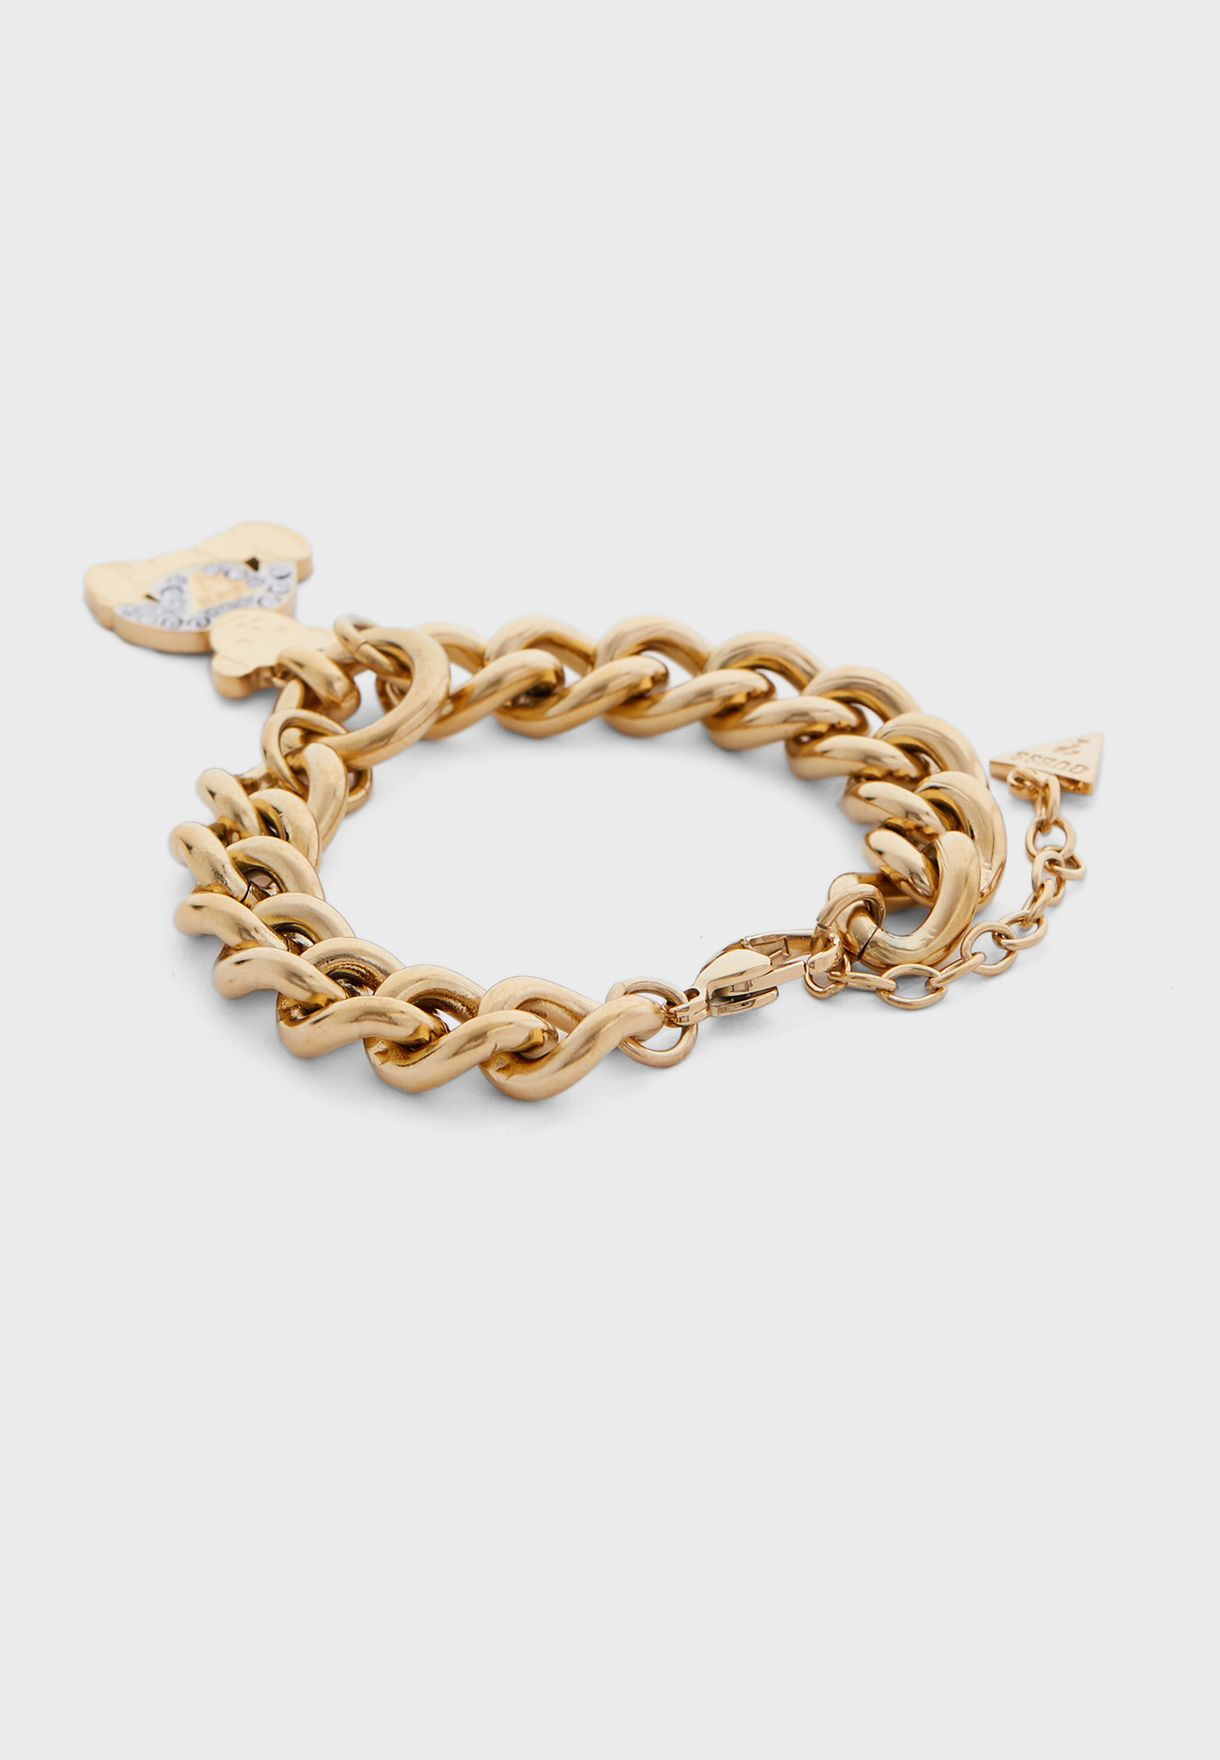 Bear Charm Bracelet